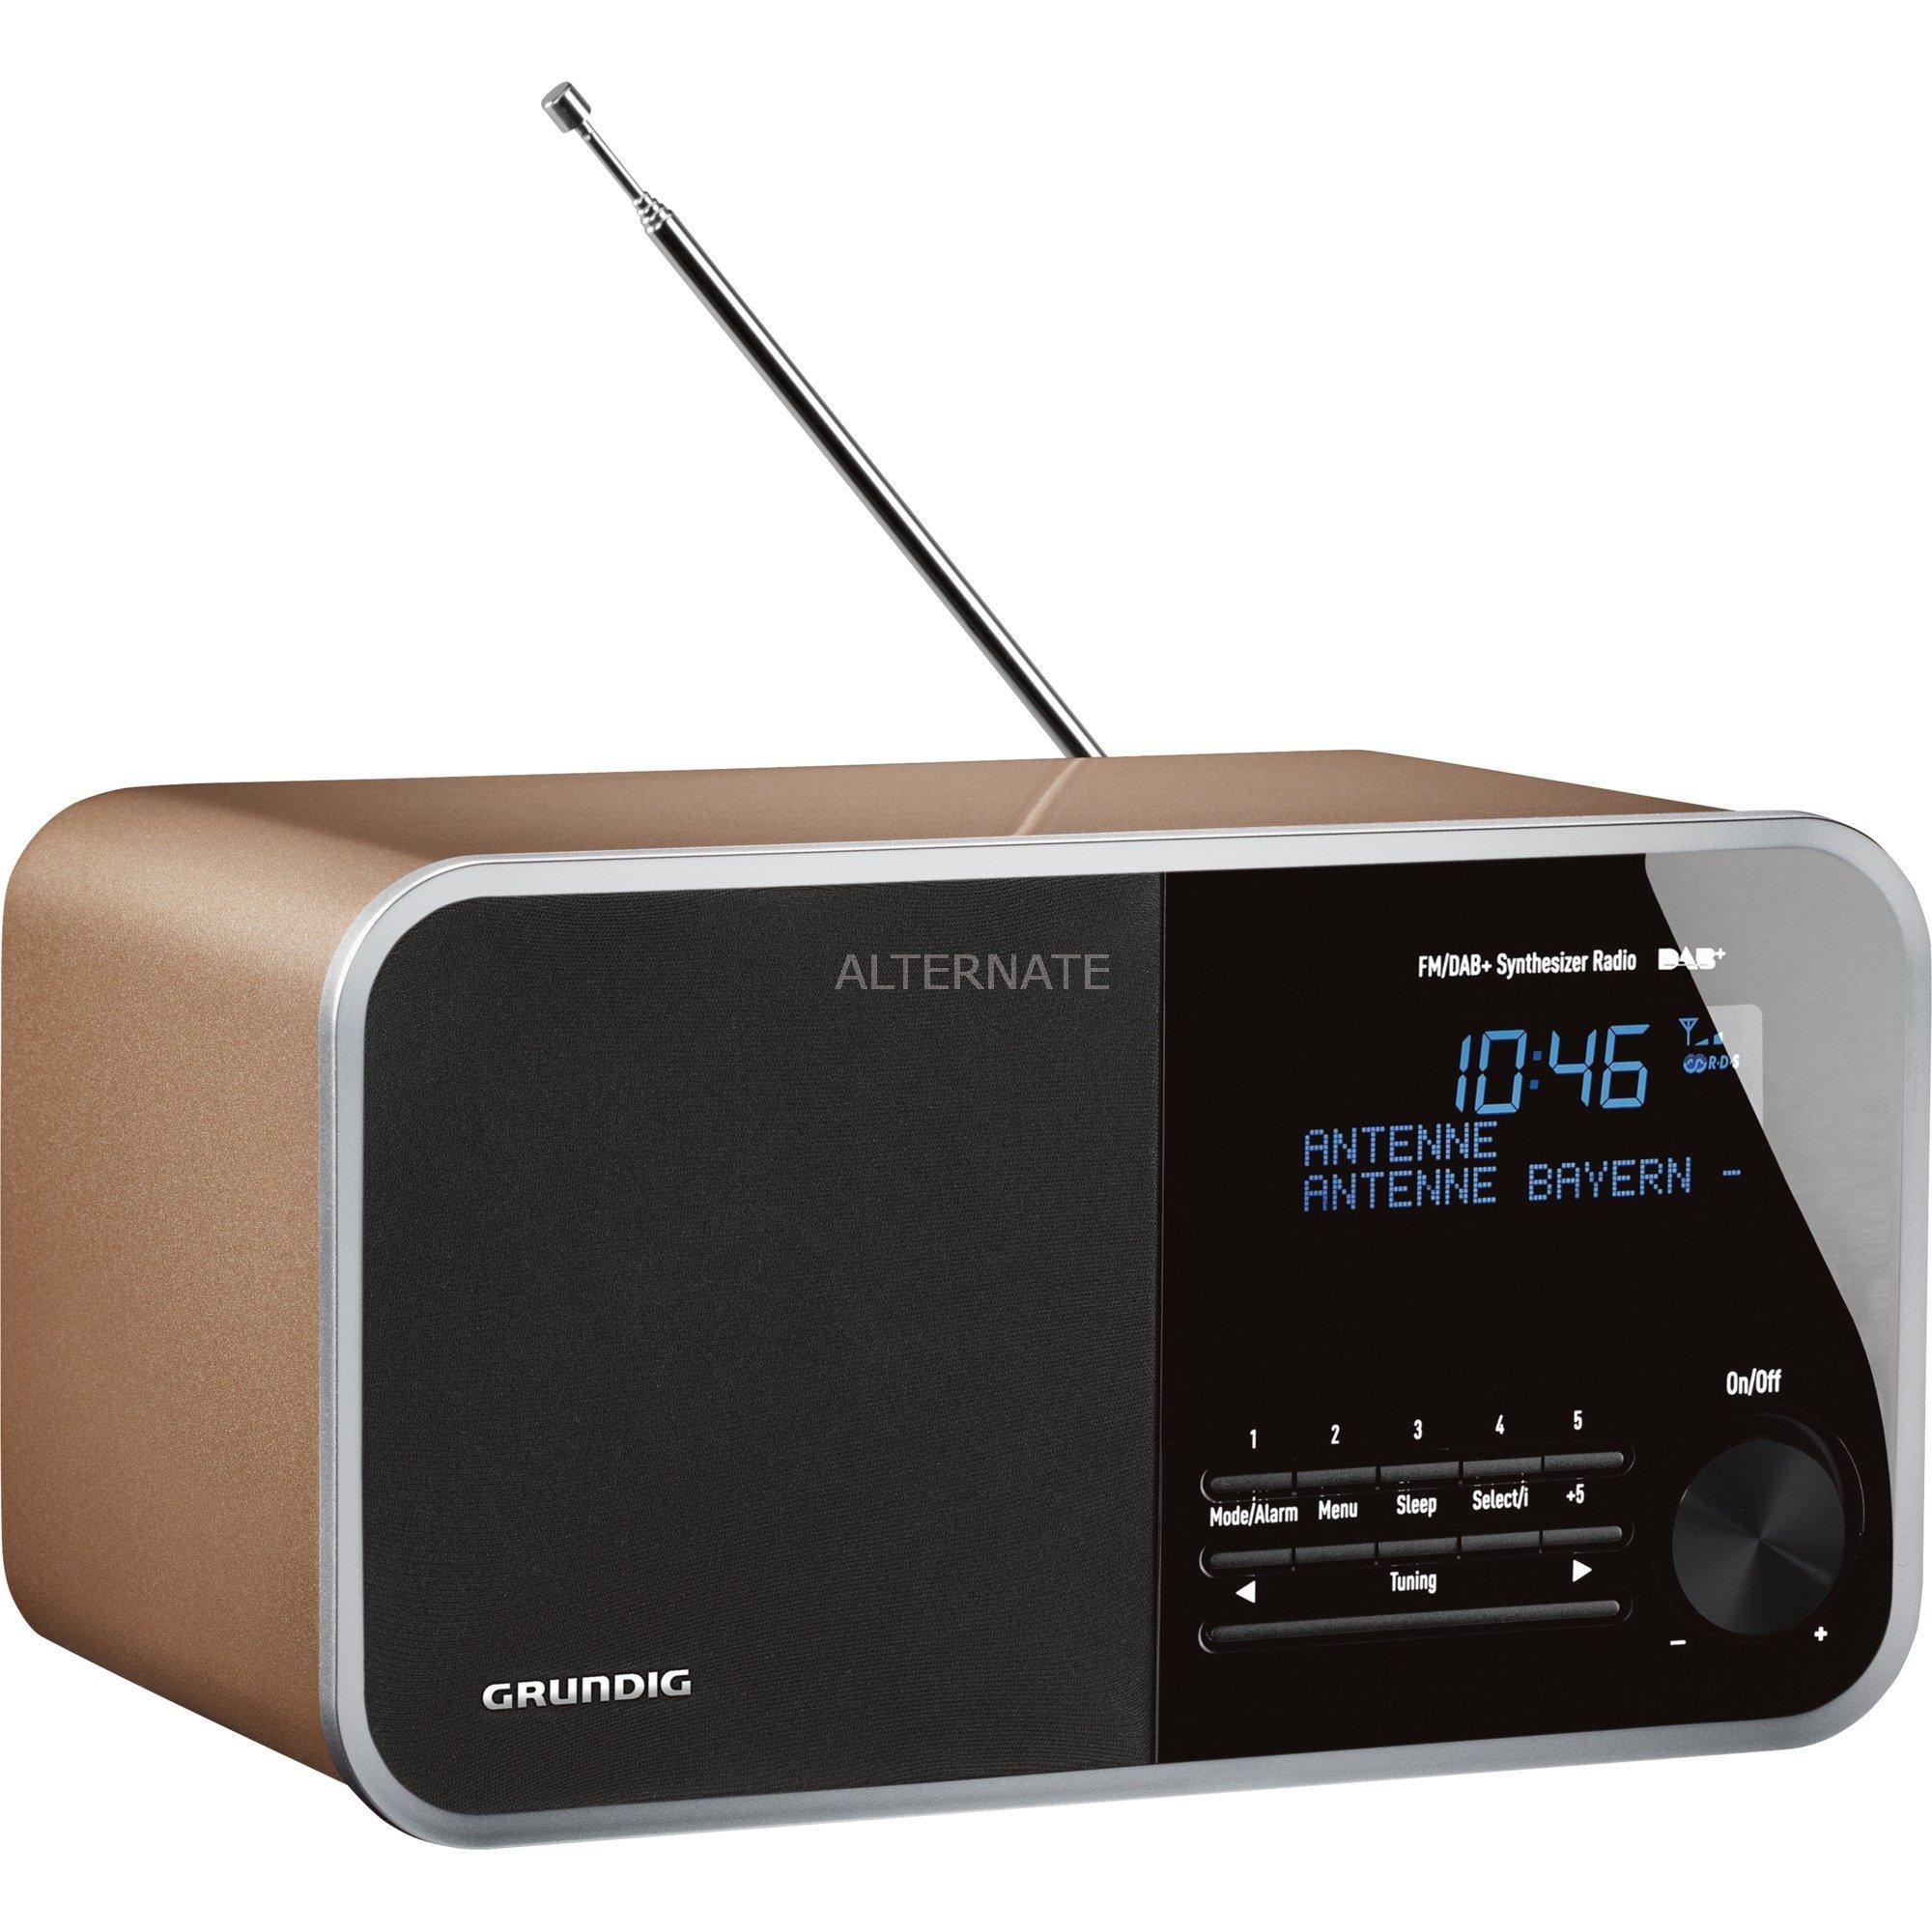 DTR 3000 DAB+ radio Personal Analógico y digital Champán